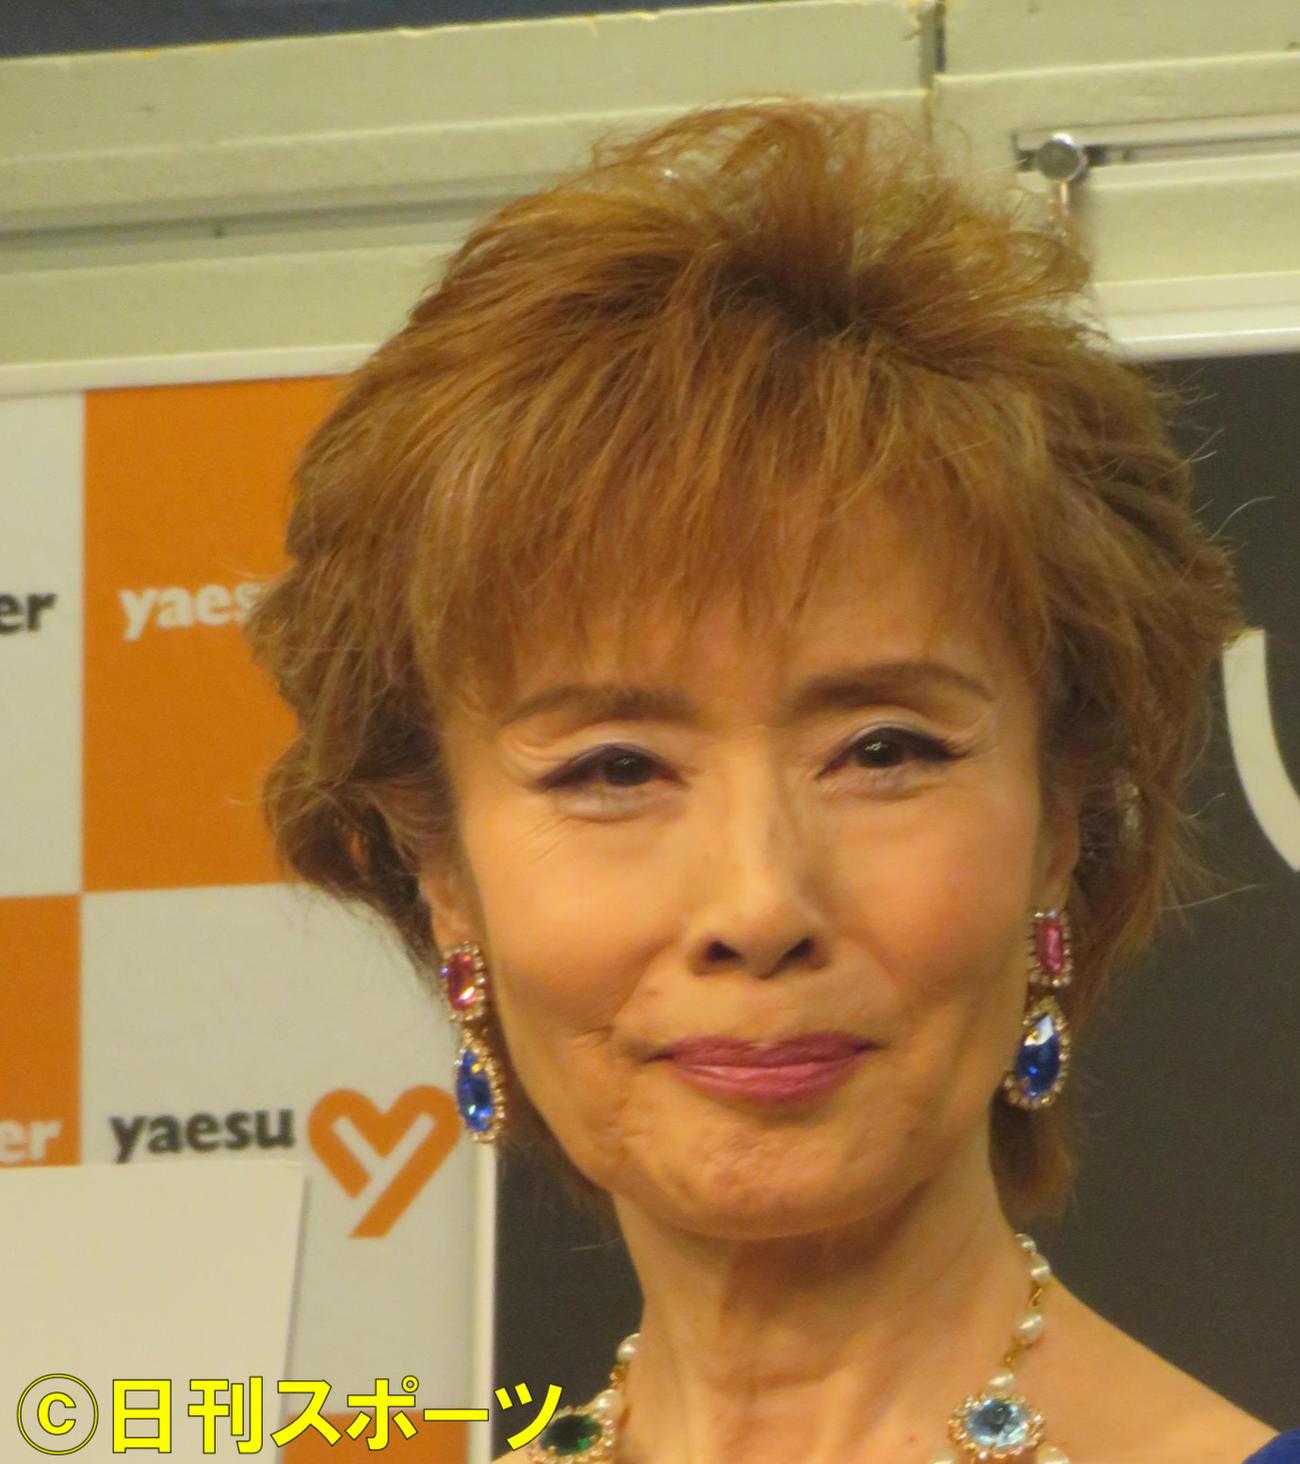 小柳ルミ子(20年9月撮影)